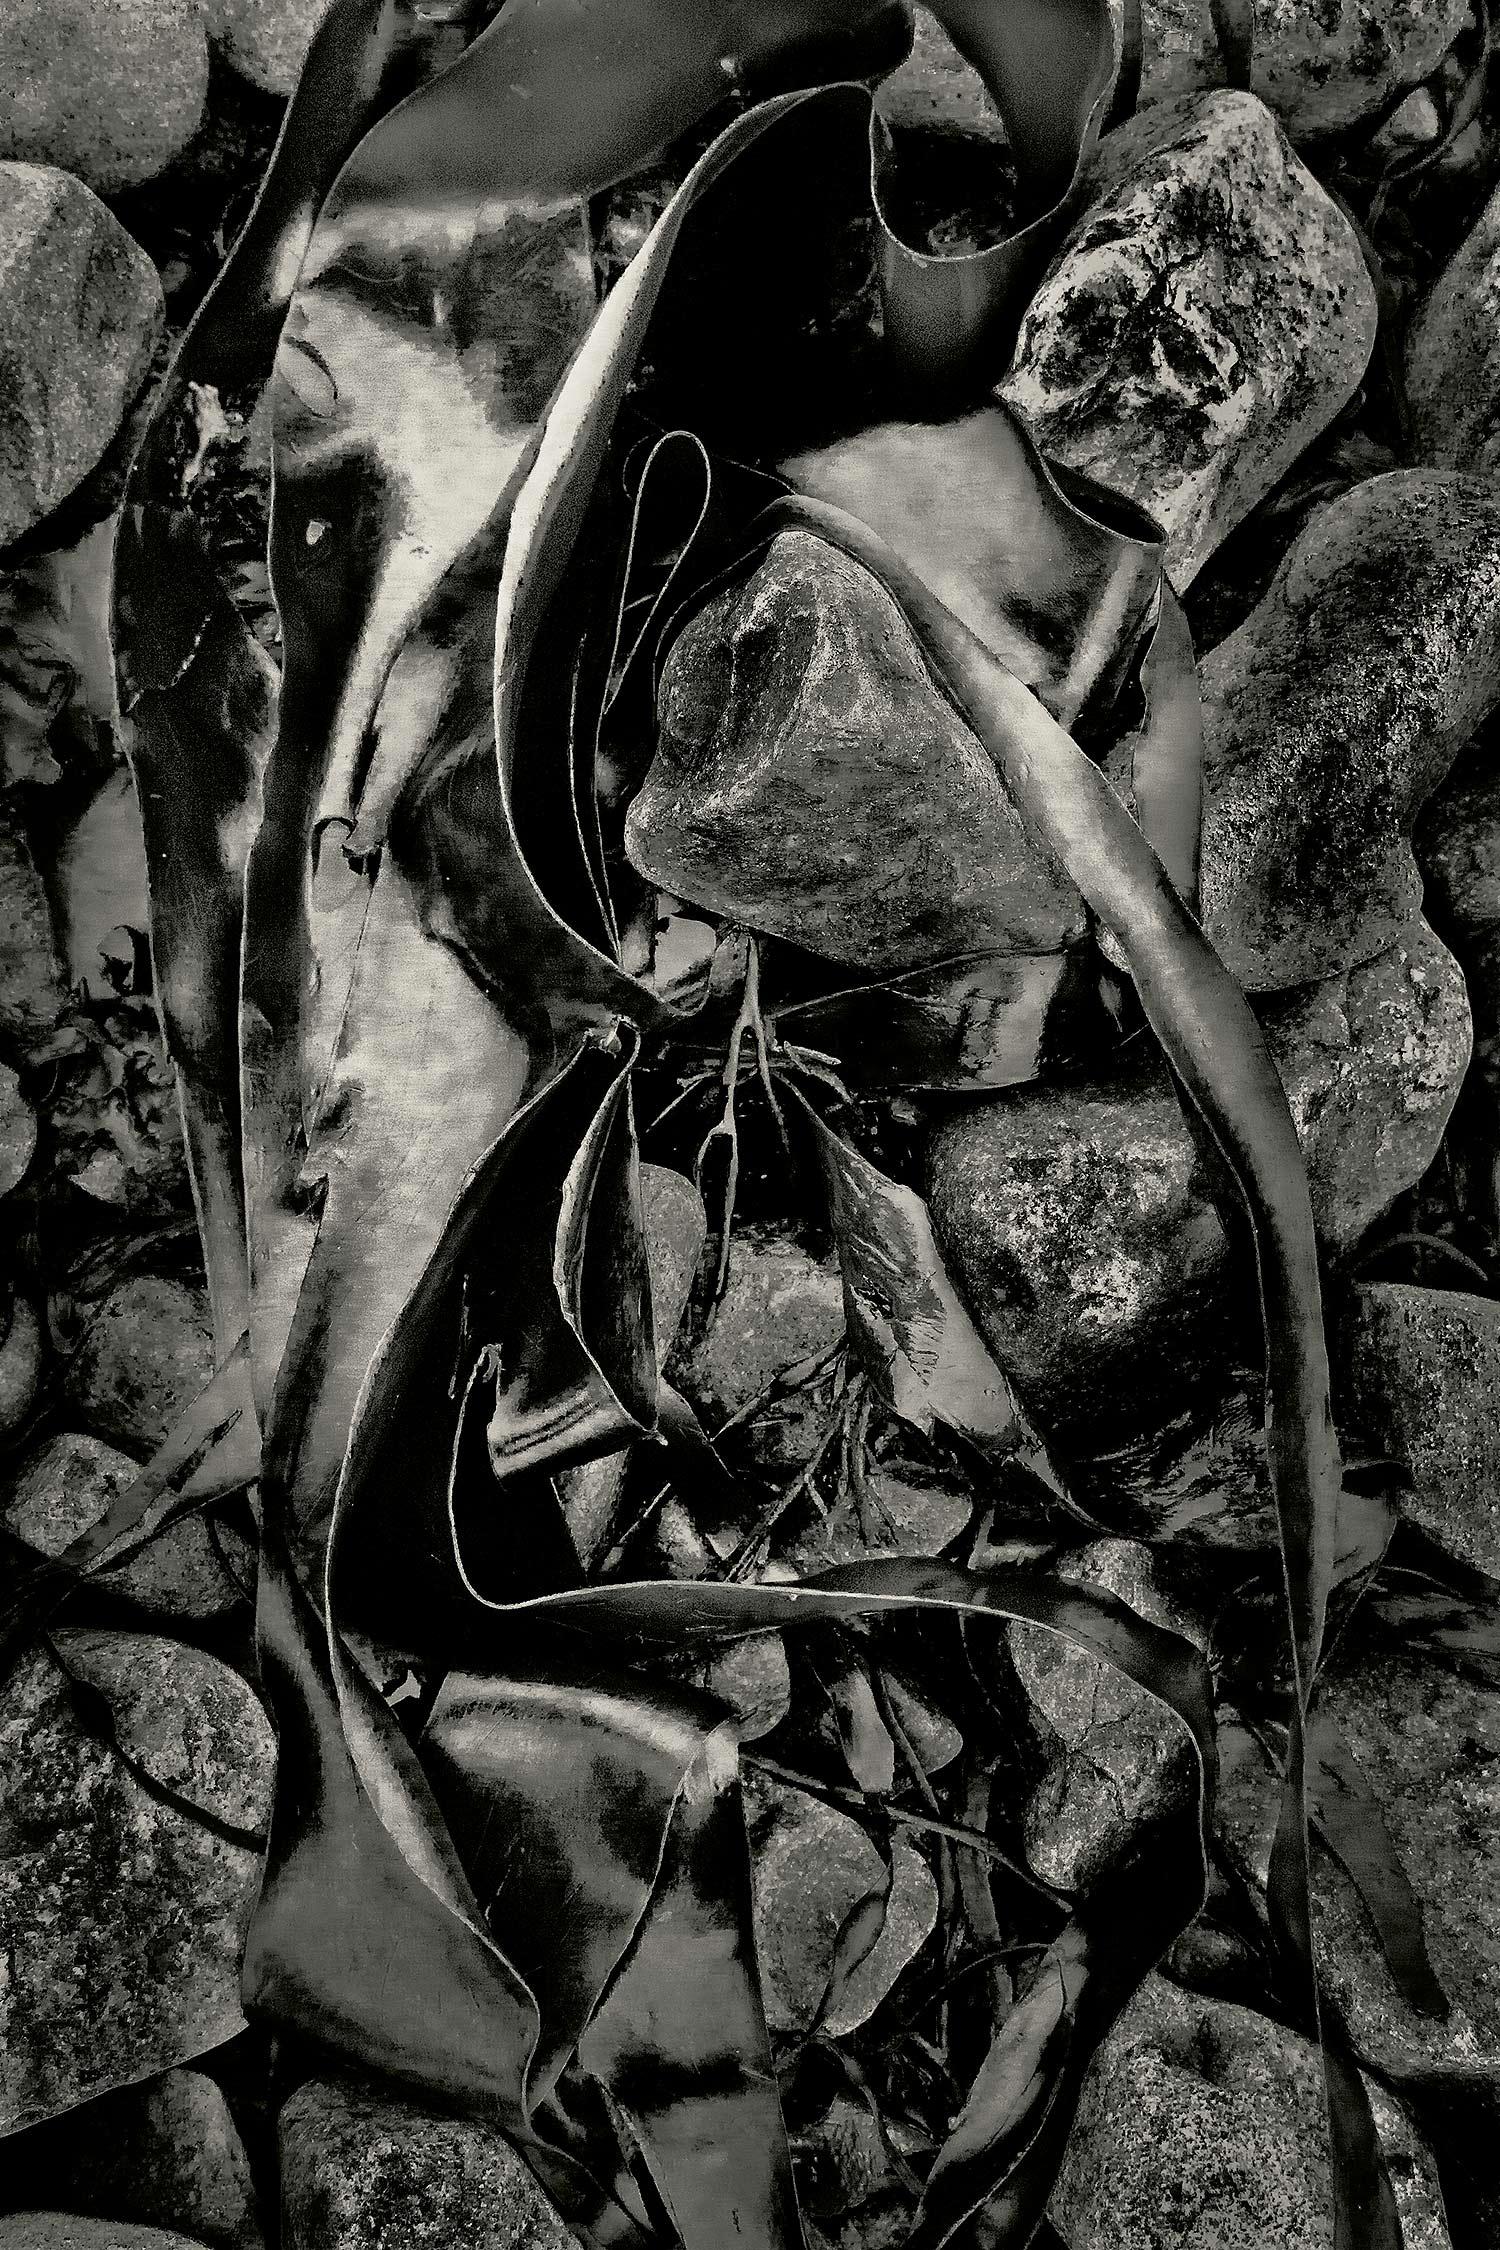 Seaweed 293, Seawall, Maine, 2011